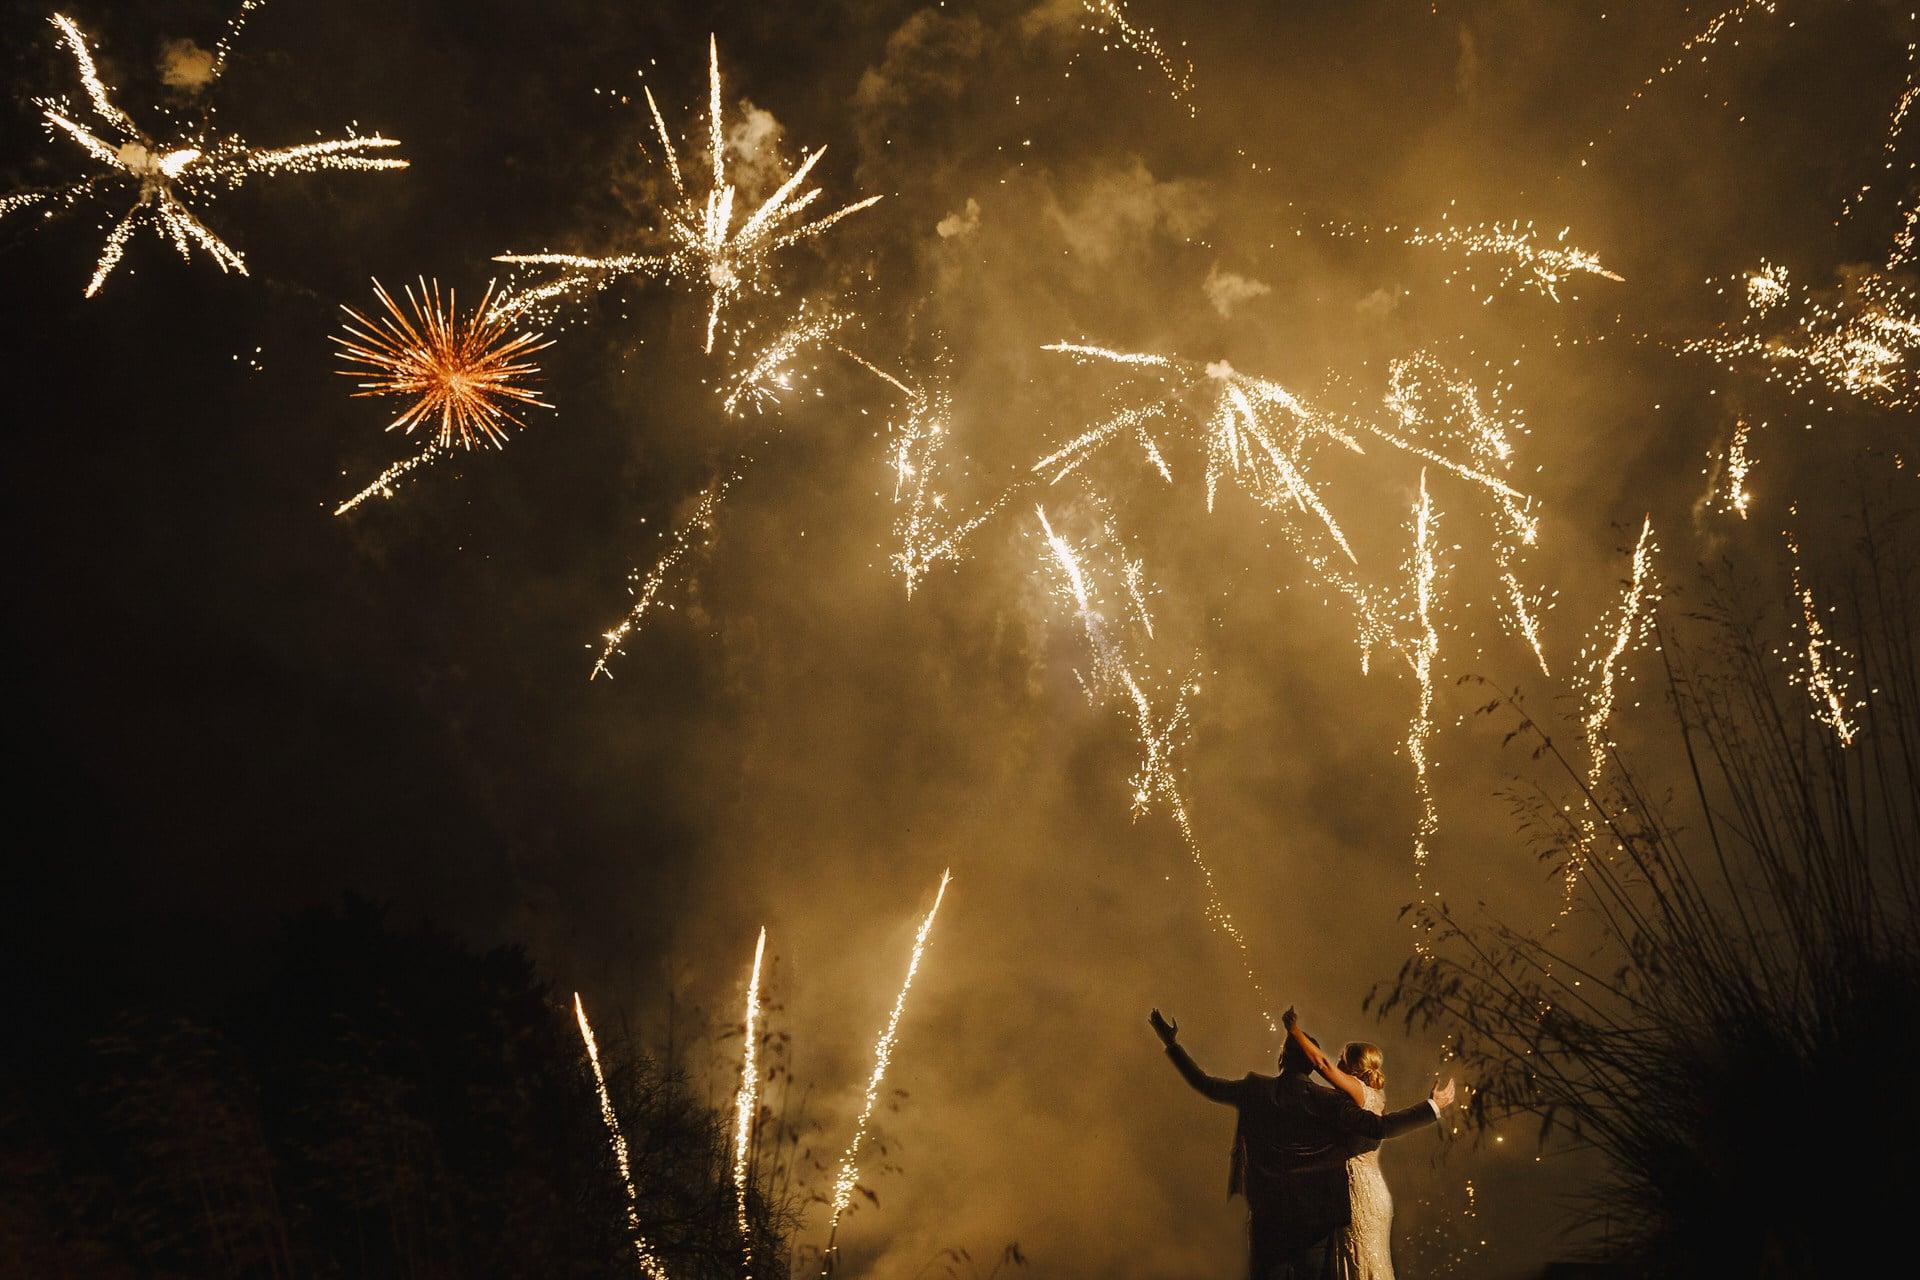 Nadine van Biljon Photography Top London Wedding Photographer Fireworks at Stoke Rochford Hall Jenny Packham Dress